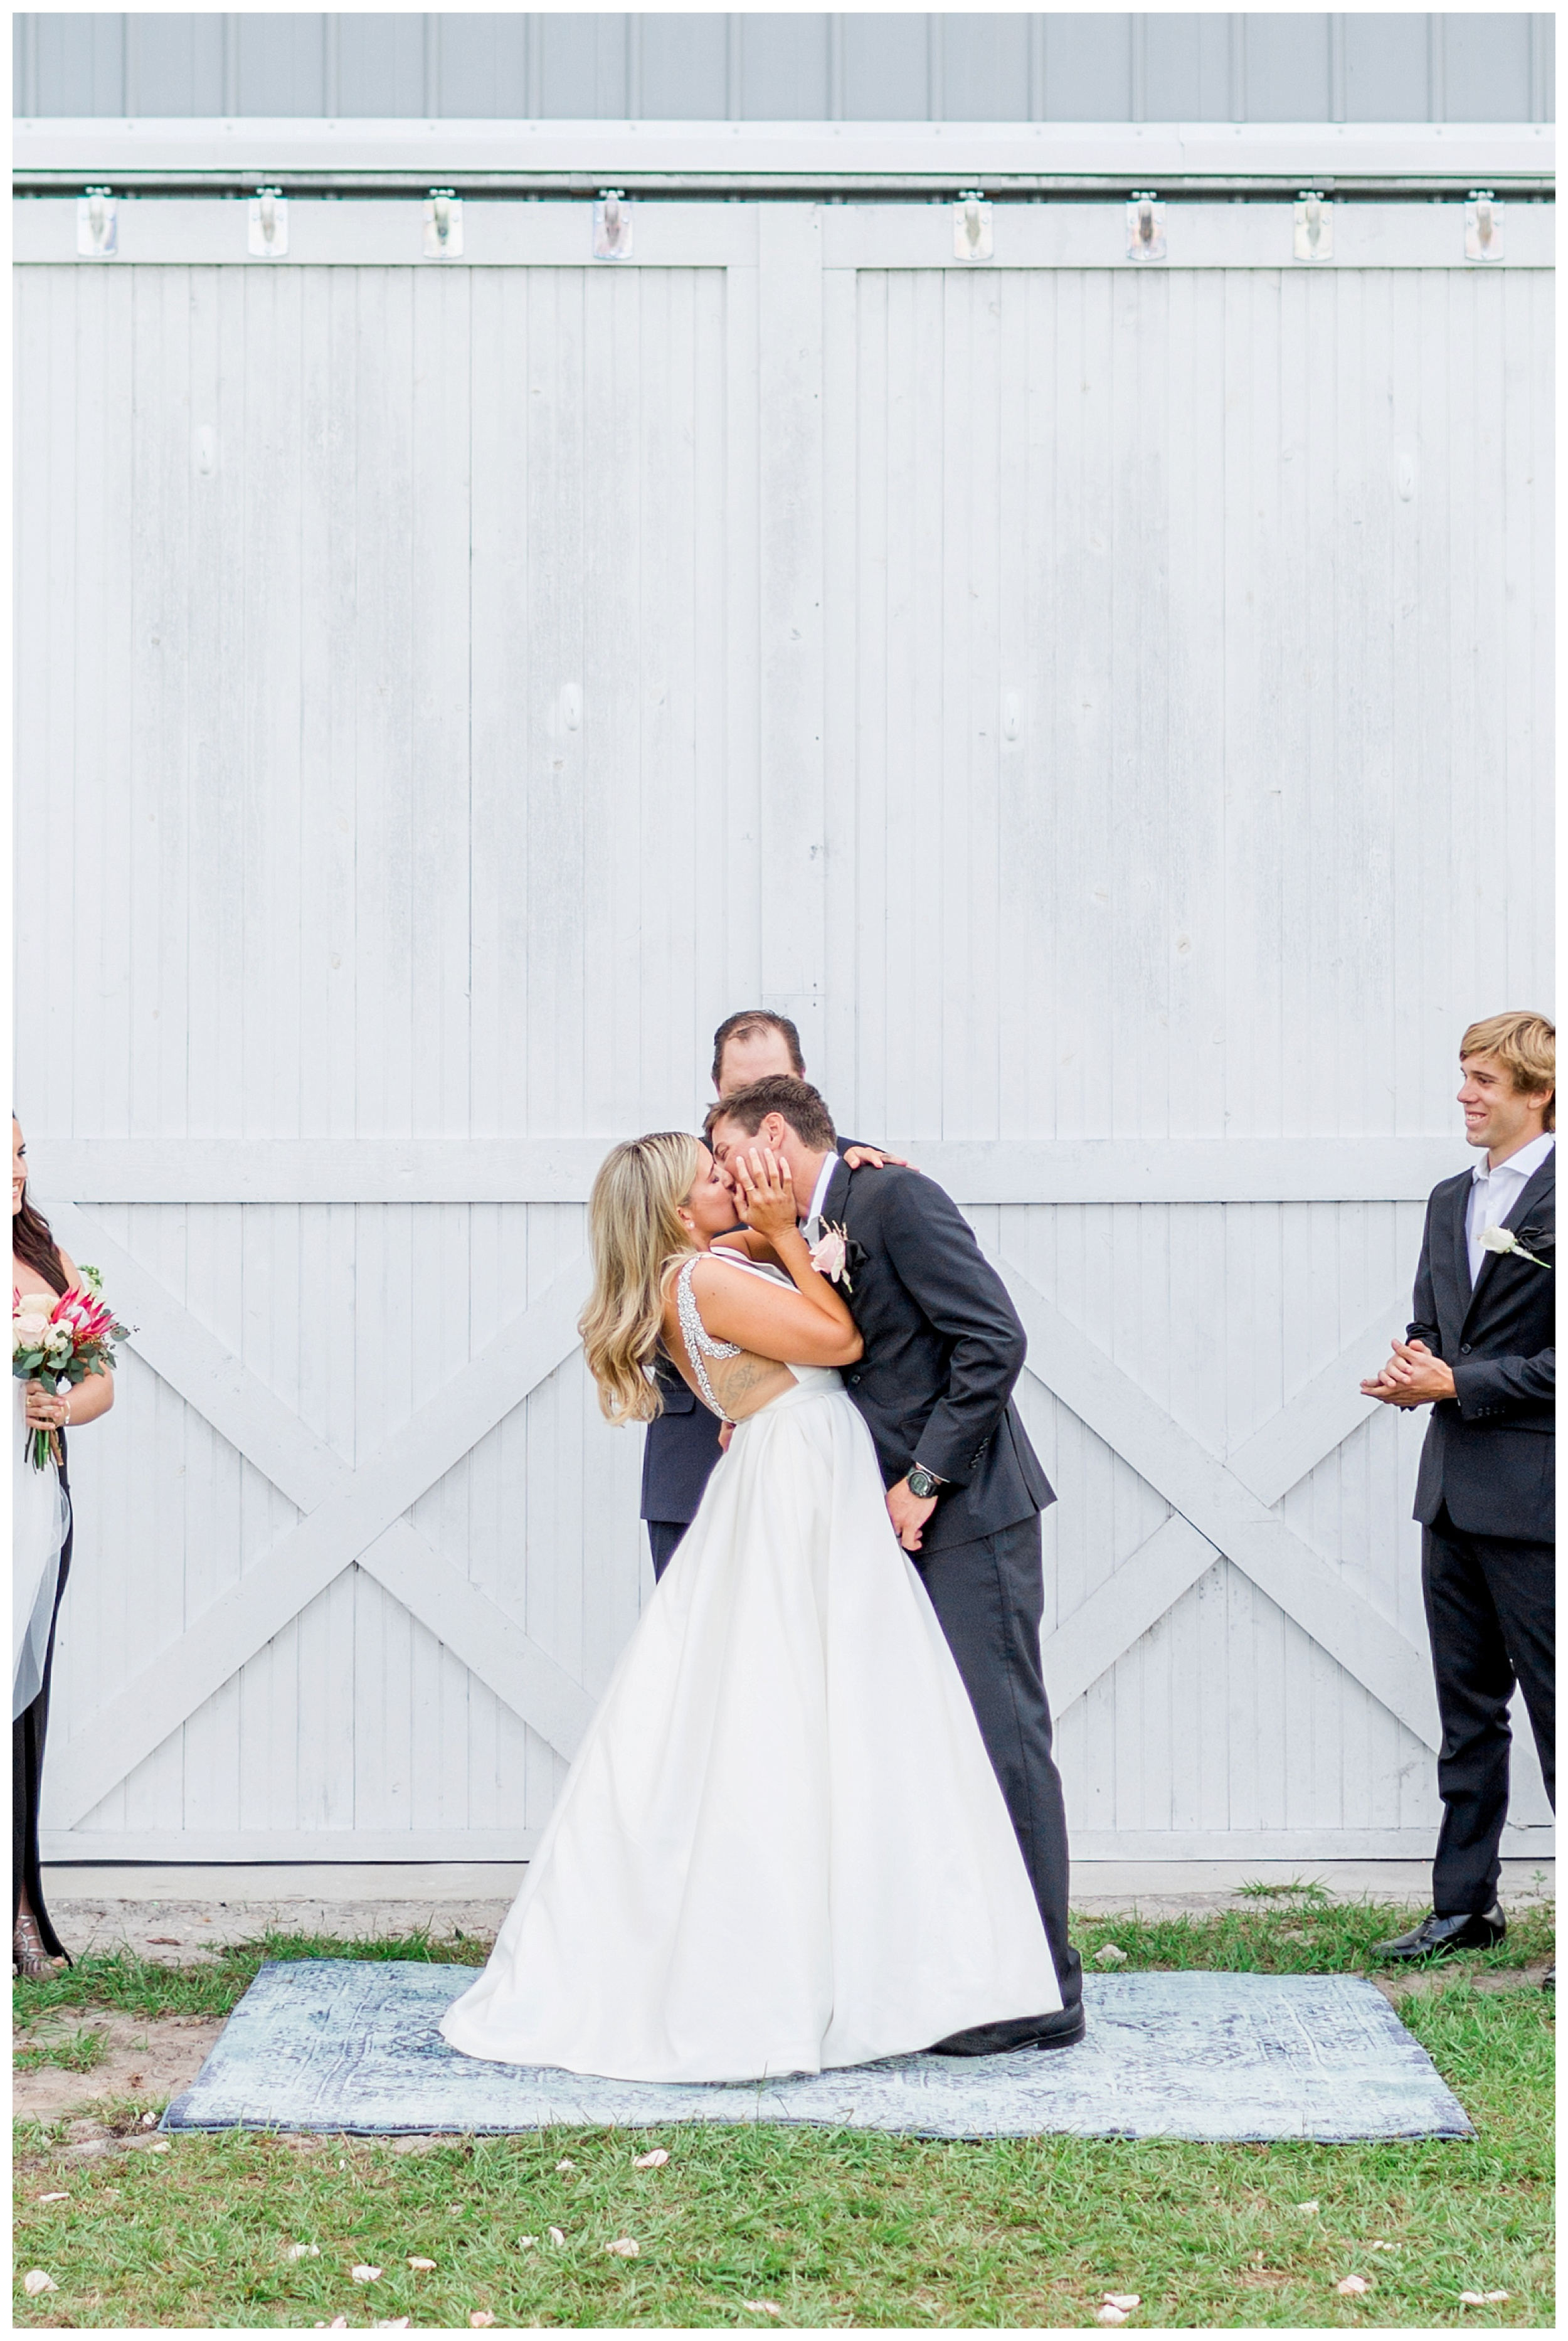 South Florida Wedding Photographer Kir Tuben_0081.jpg